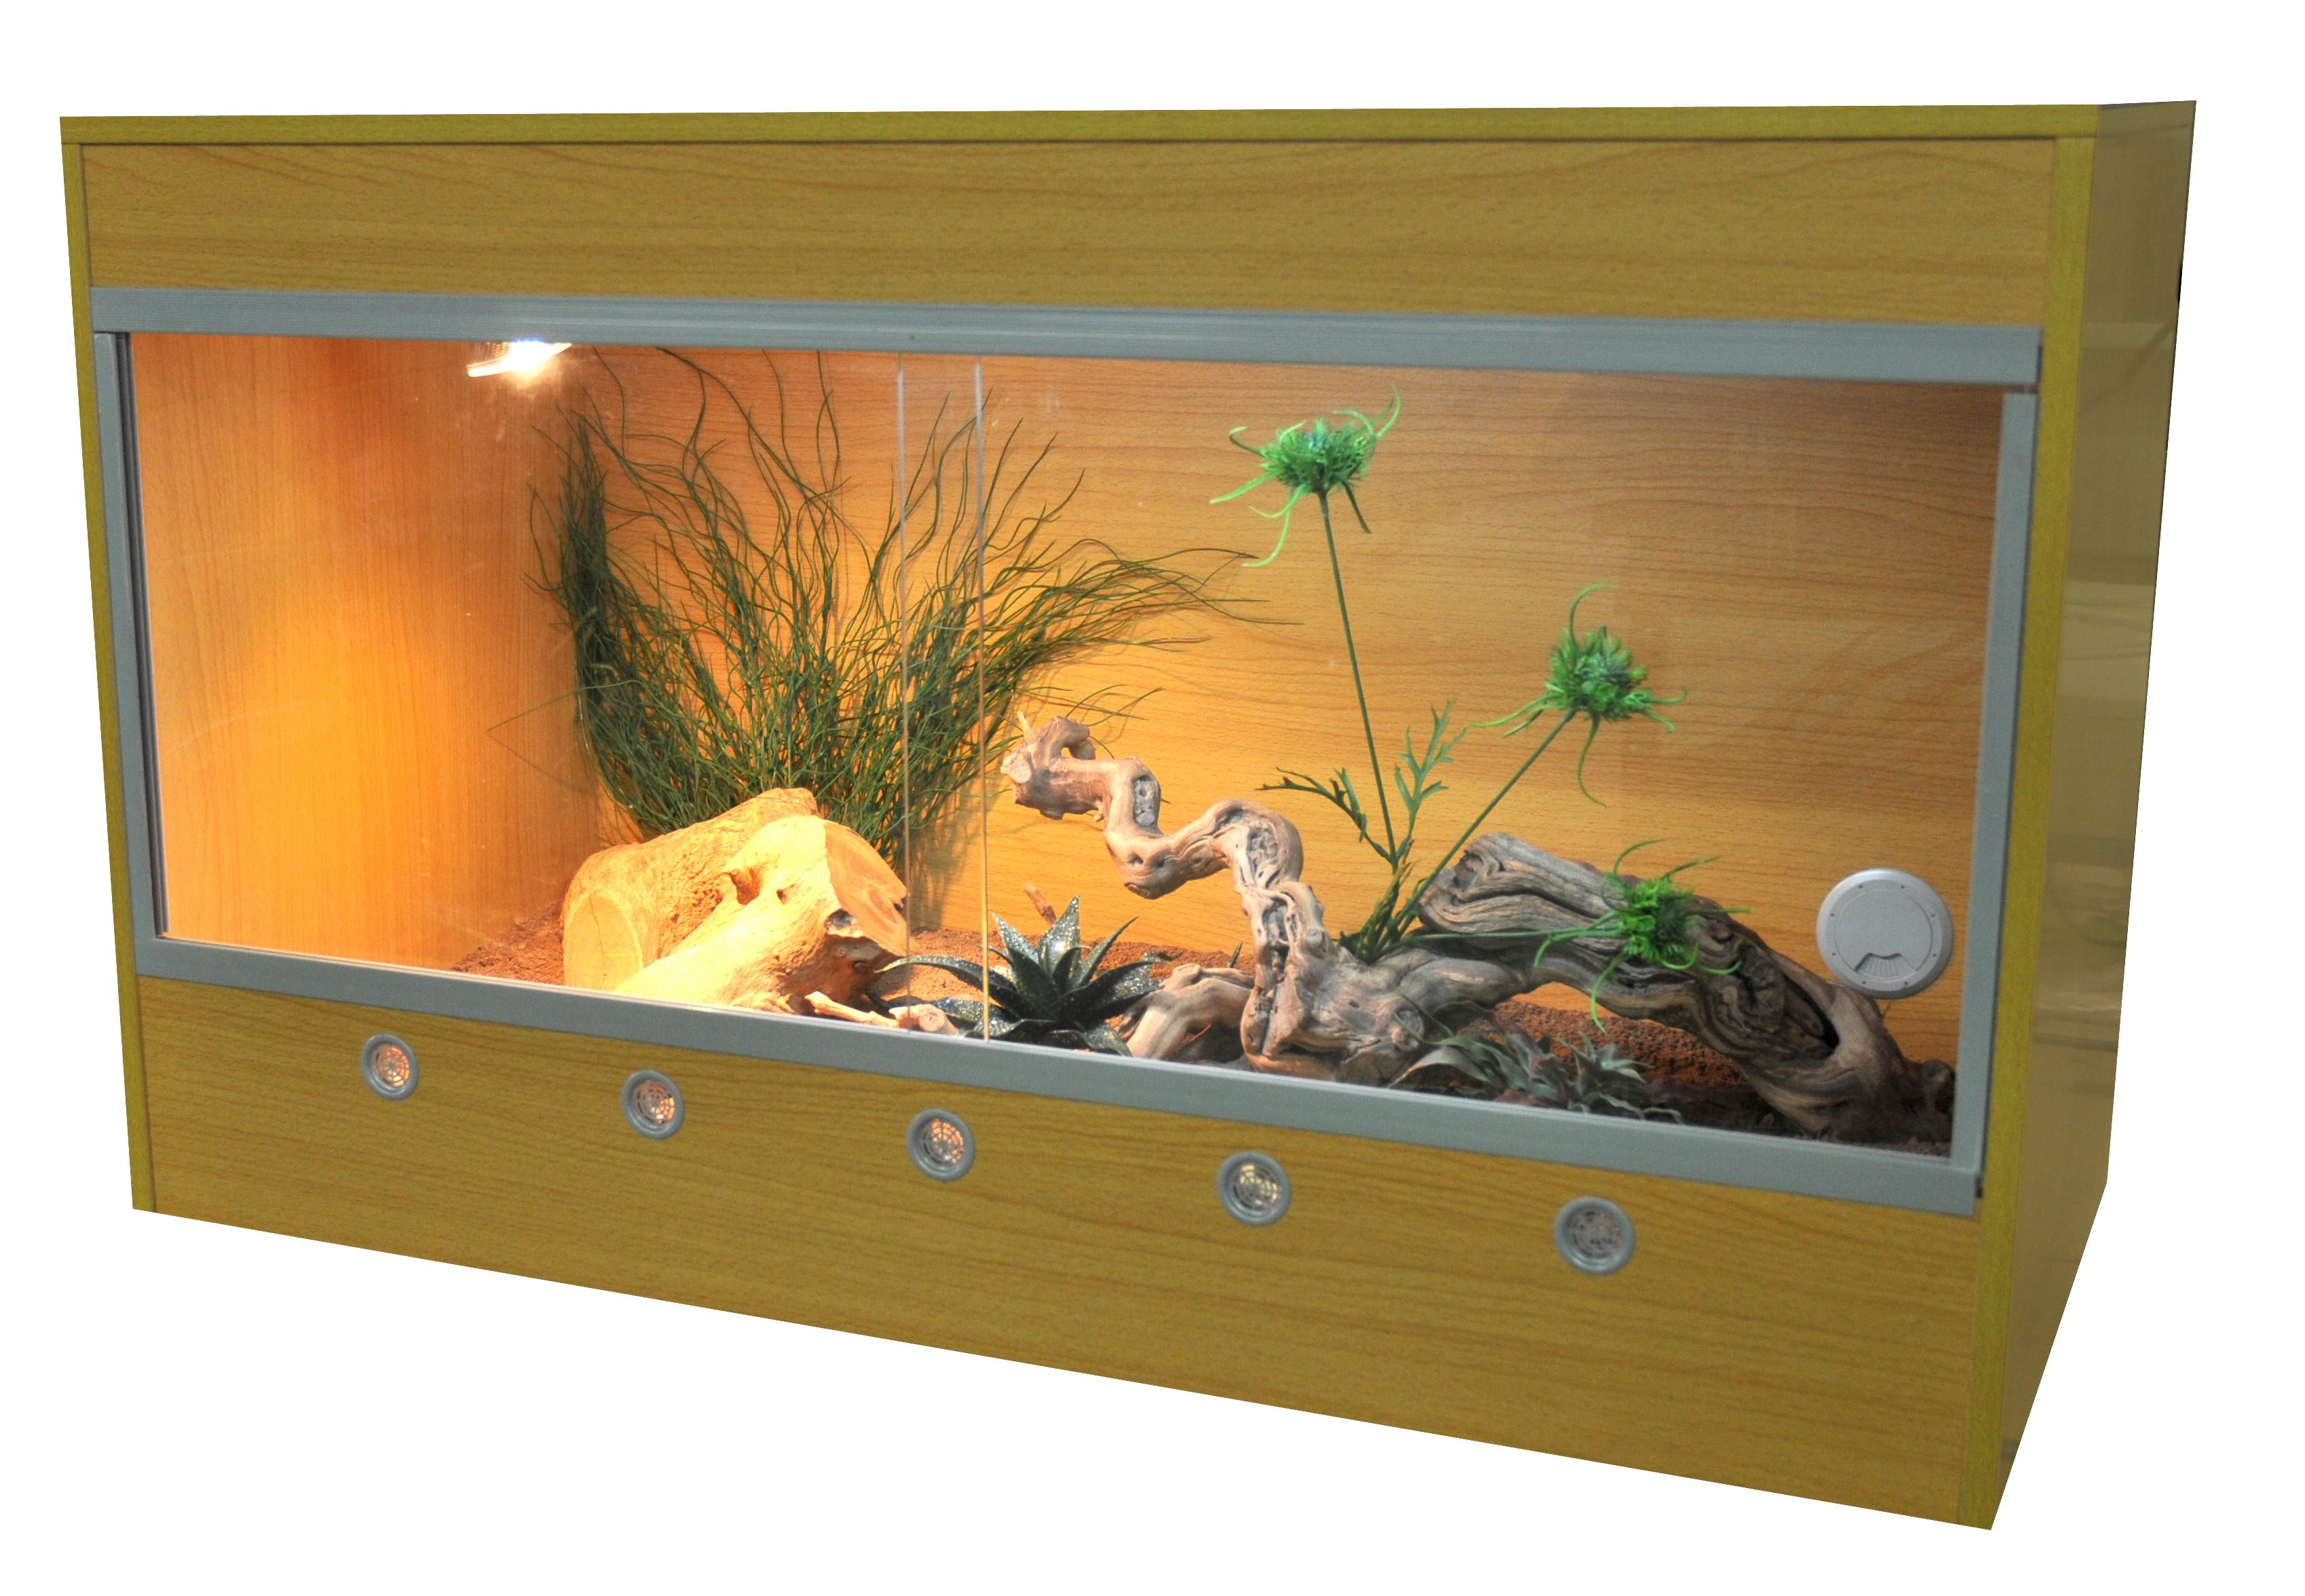 Holz-Terrarium von Lucky Reptile 80x50x100 (BxTxH)